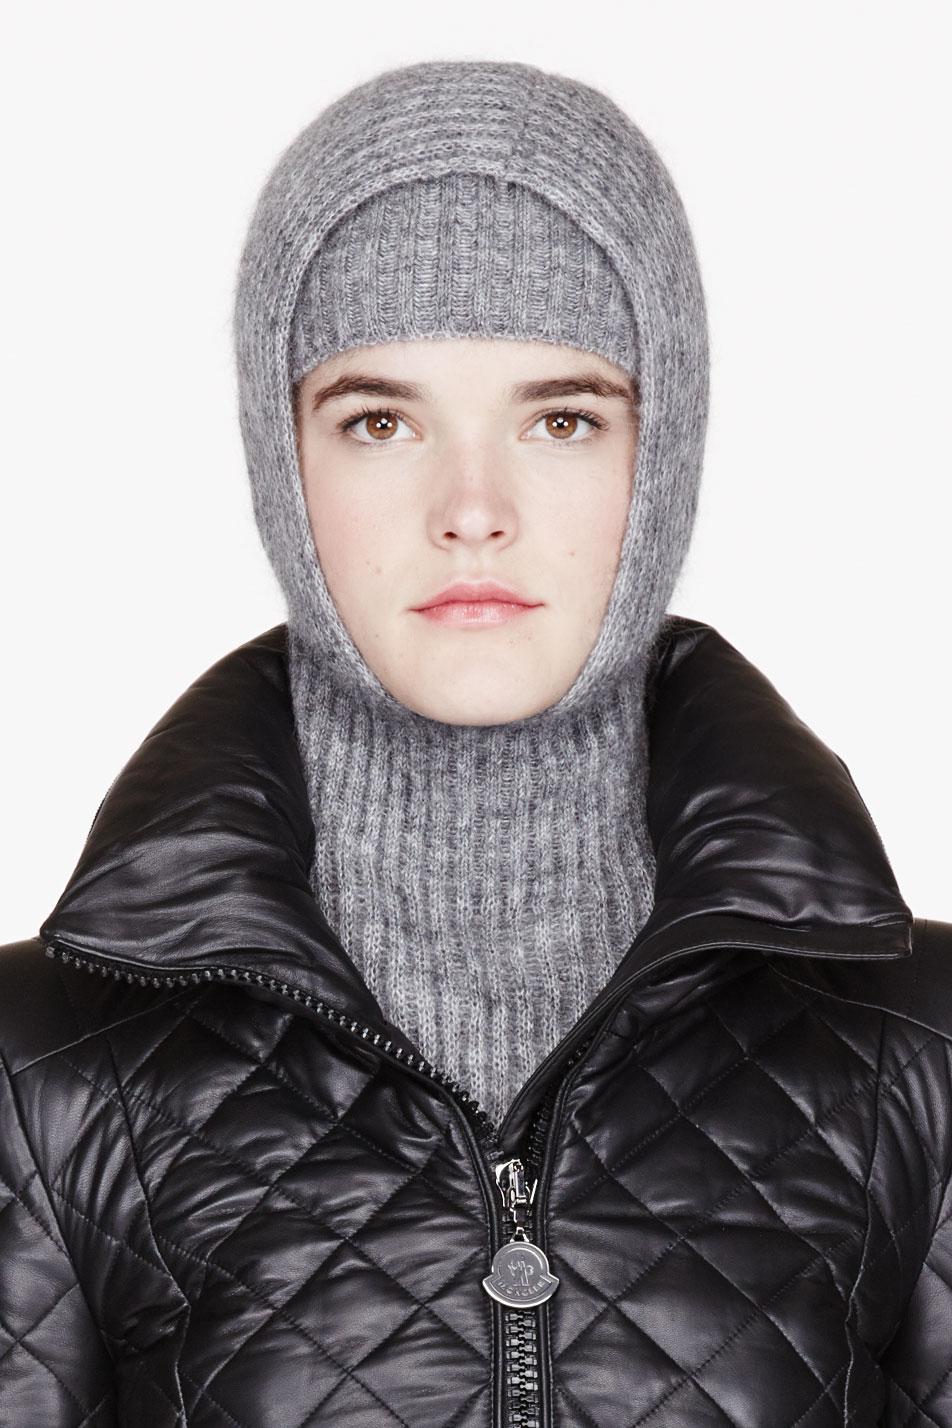 Lyst - Alexander Wang Grey Mohair Ribbed Hooded Snood and Headband ... 21683f35fea